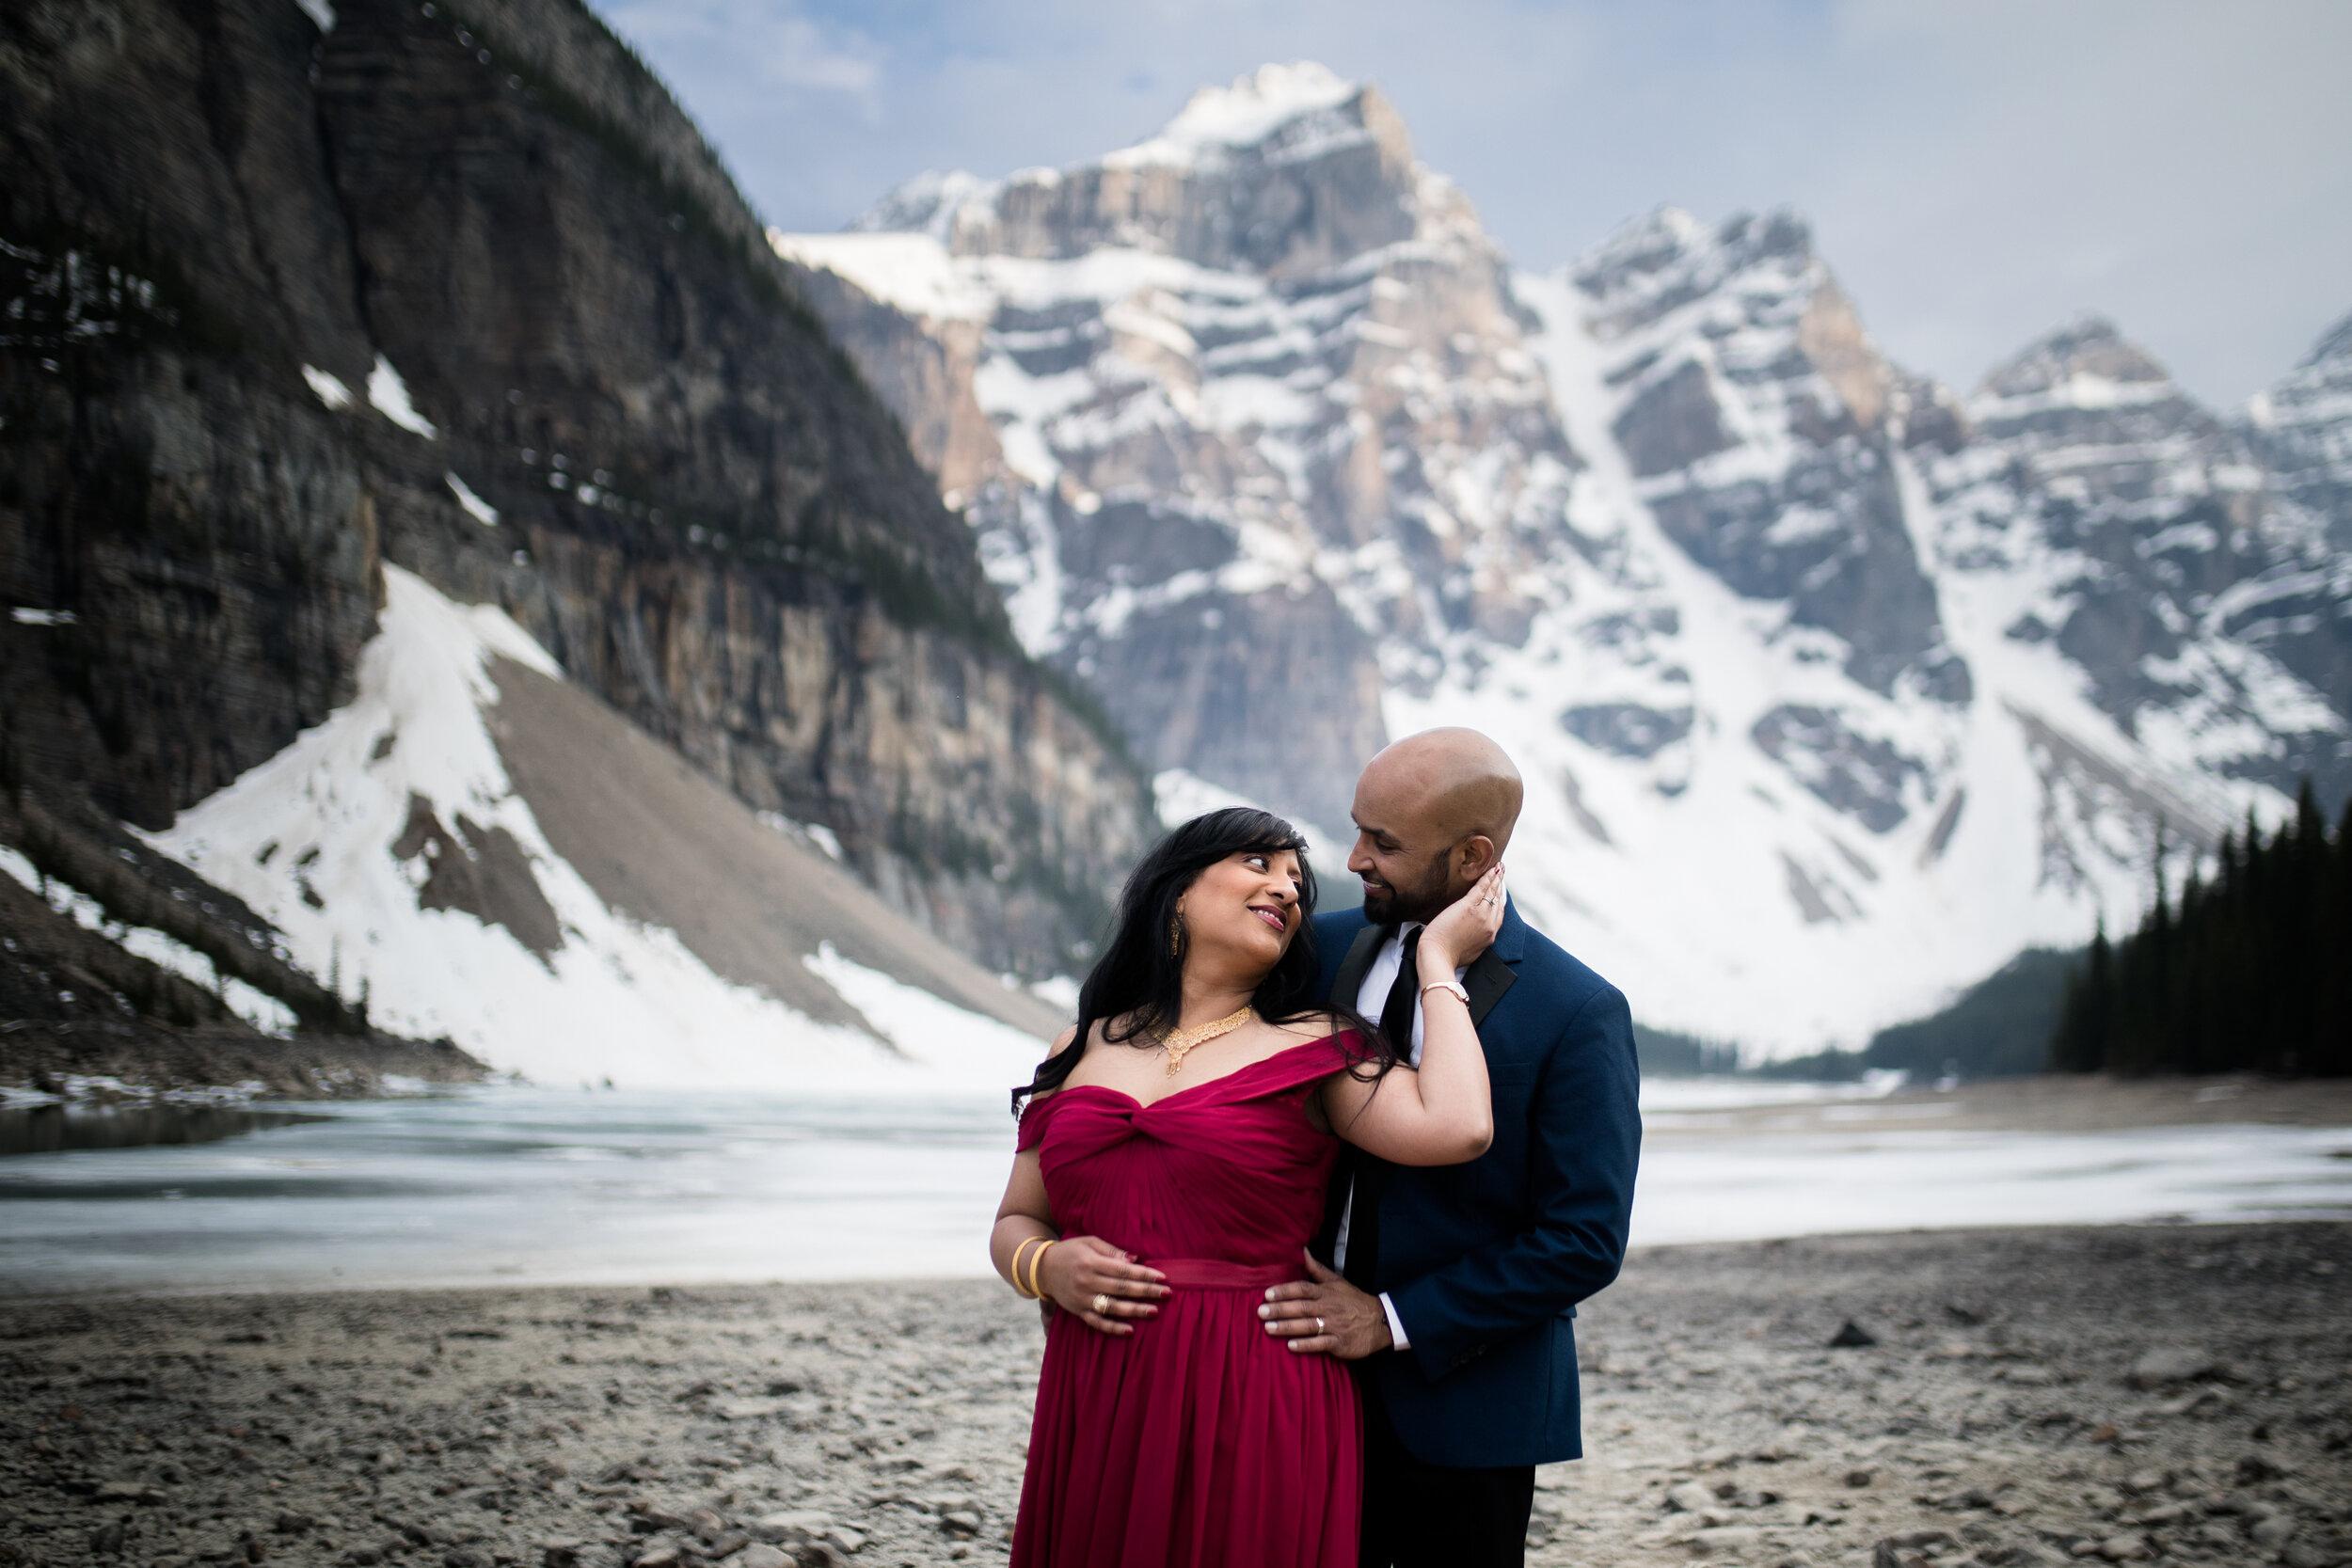 couples 3 banff-05-30-2019-anniversary-29_original.jpeg